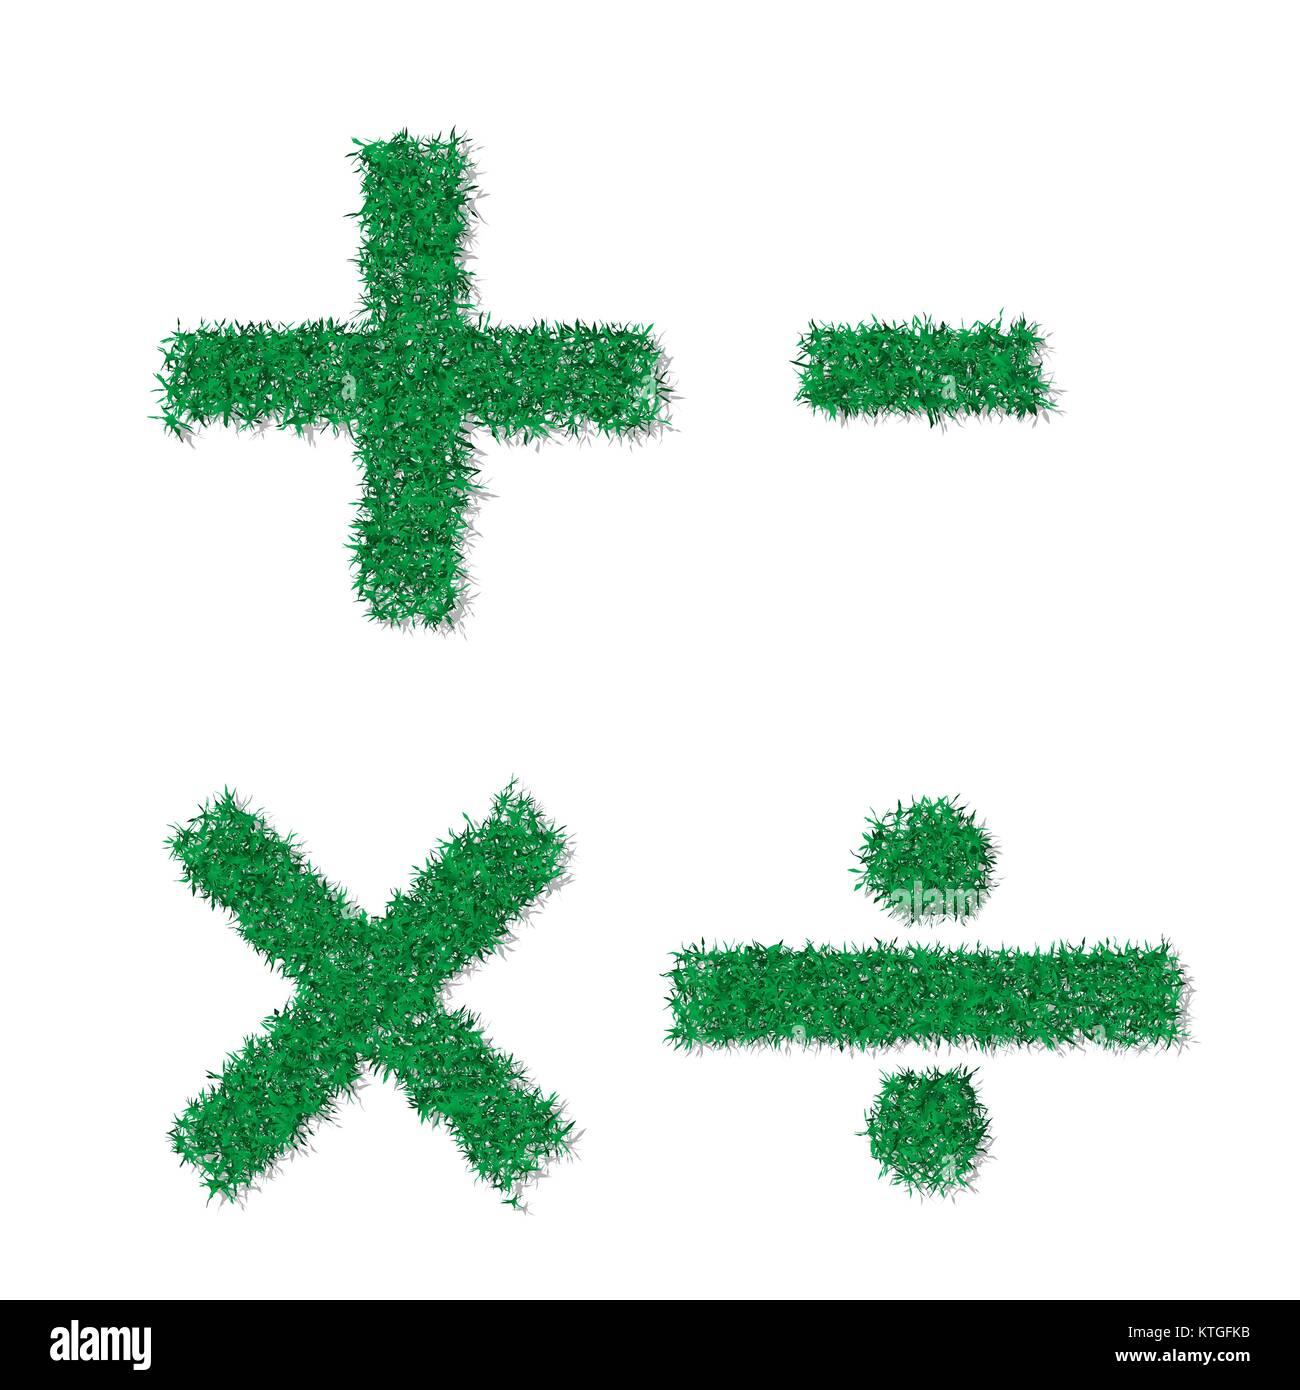 Vector green grass texture math symbols stock vector art vector green grass texture math symbols publicscrutiny Choice Image